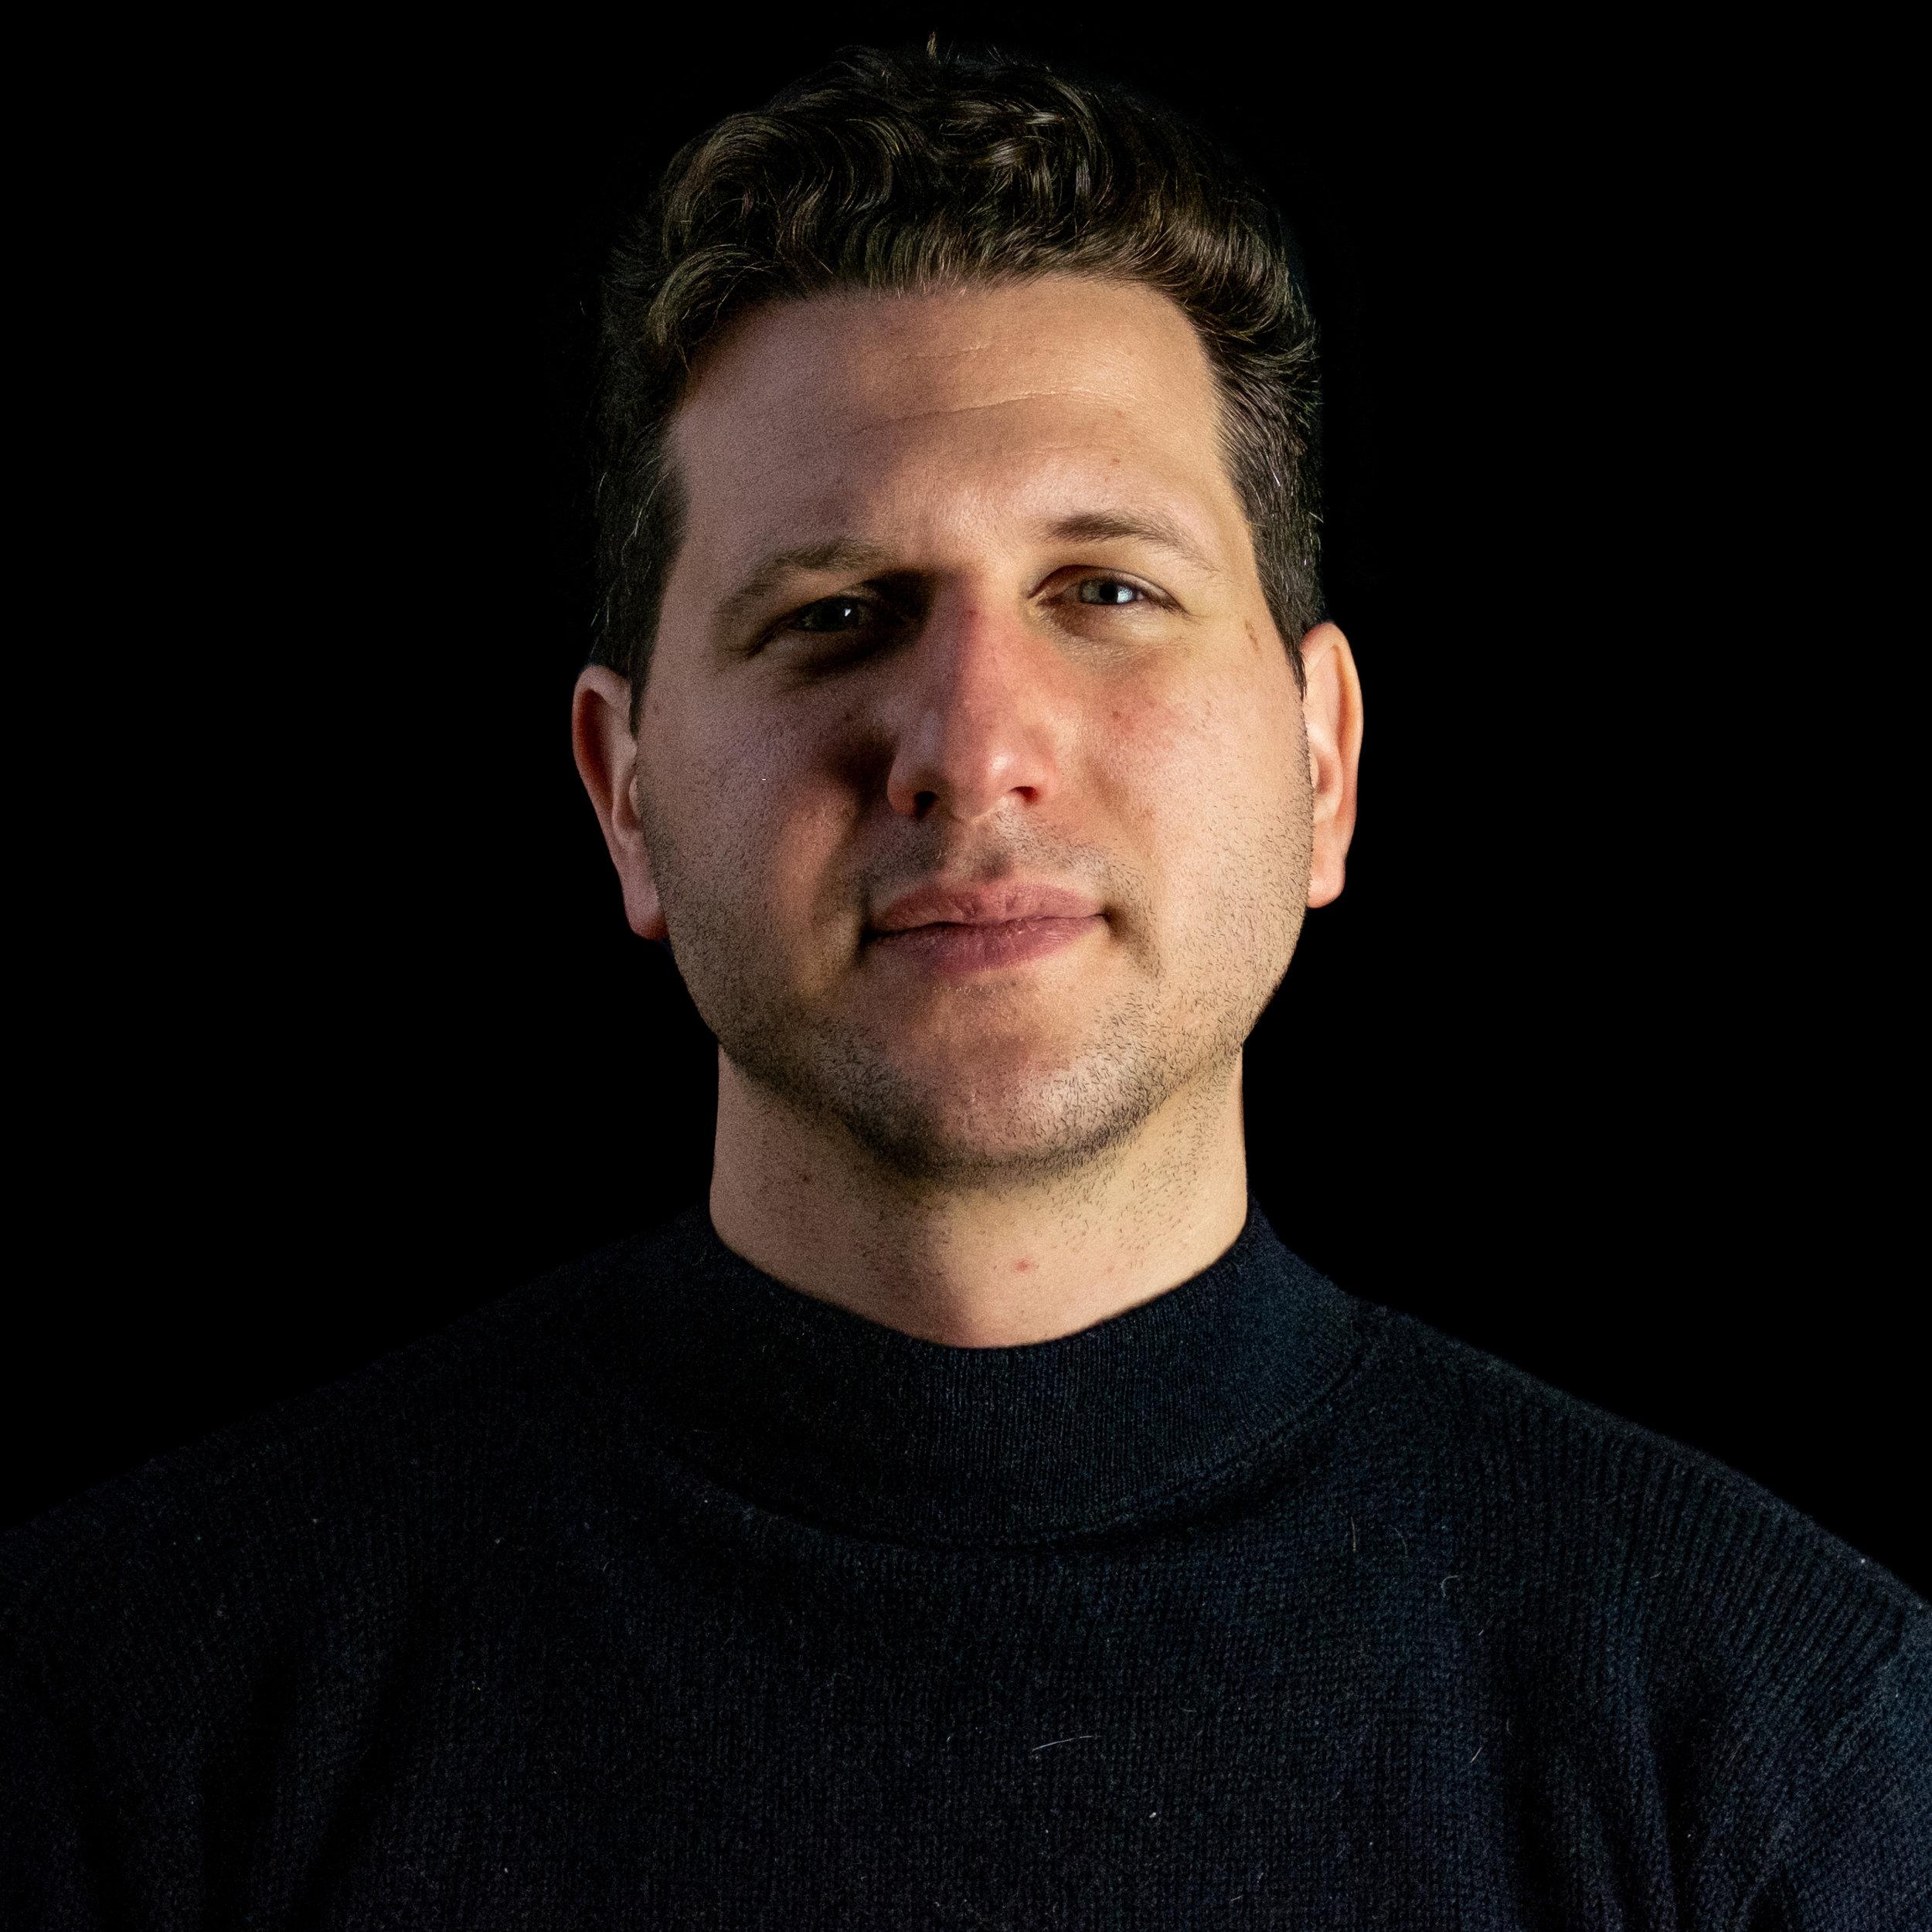 Noah Friedman Headshot Color.jpg